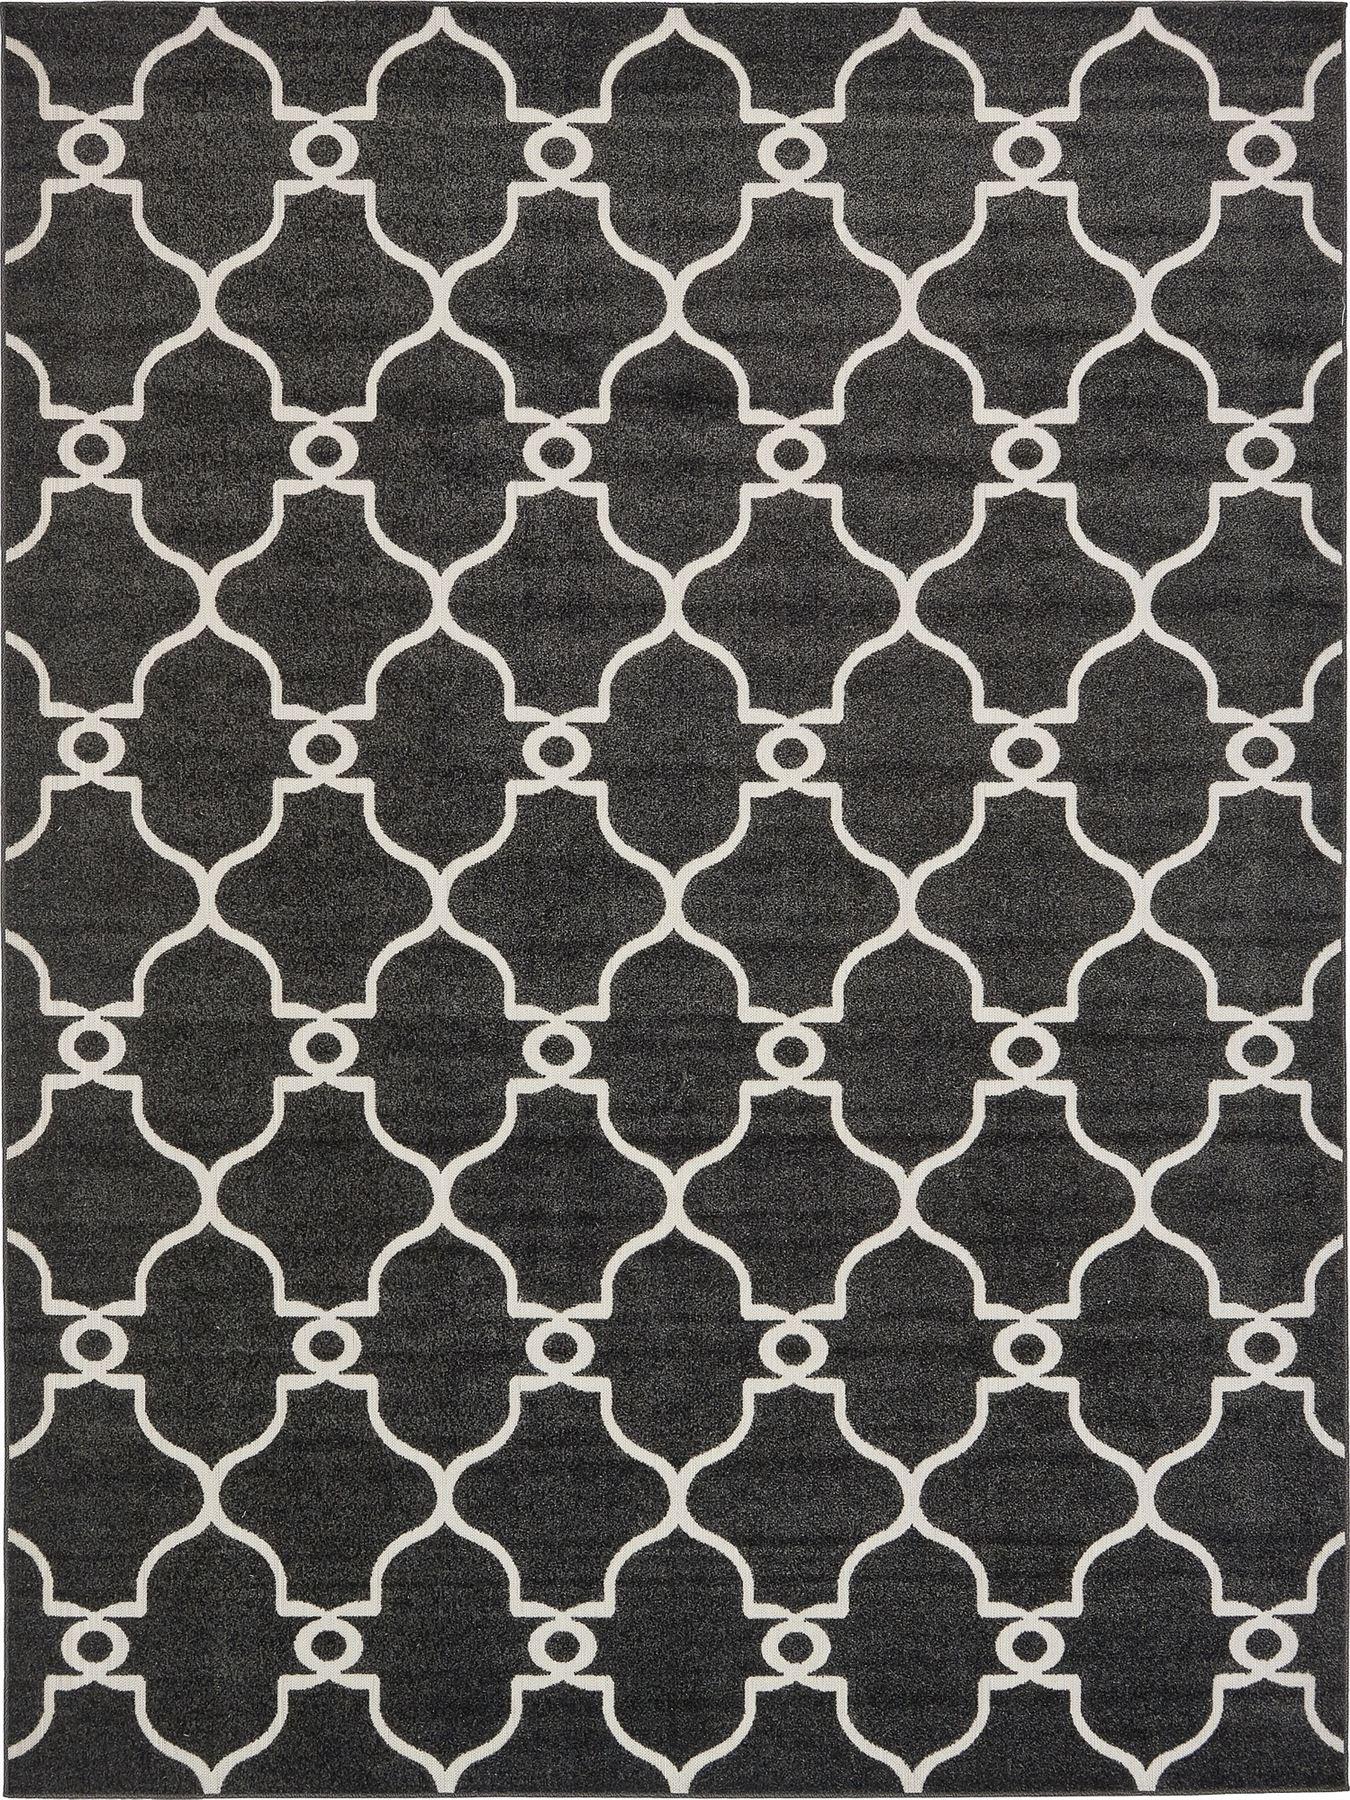 Carpet cleaning receipt joy studio design gallery best design - Fringeless Modern Rugs Geometric Carpets Floor Rug Area